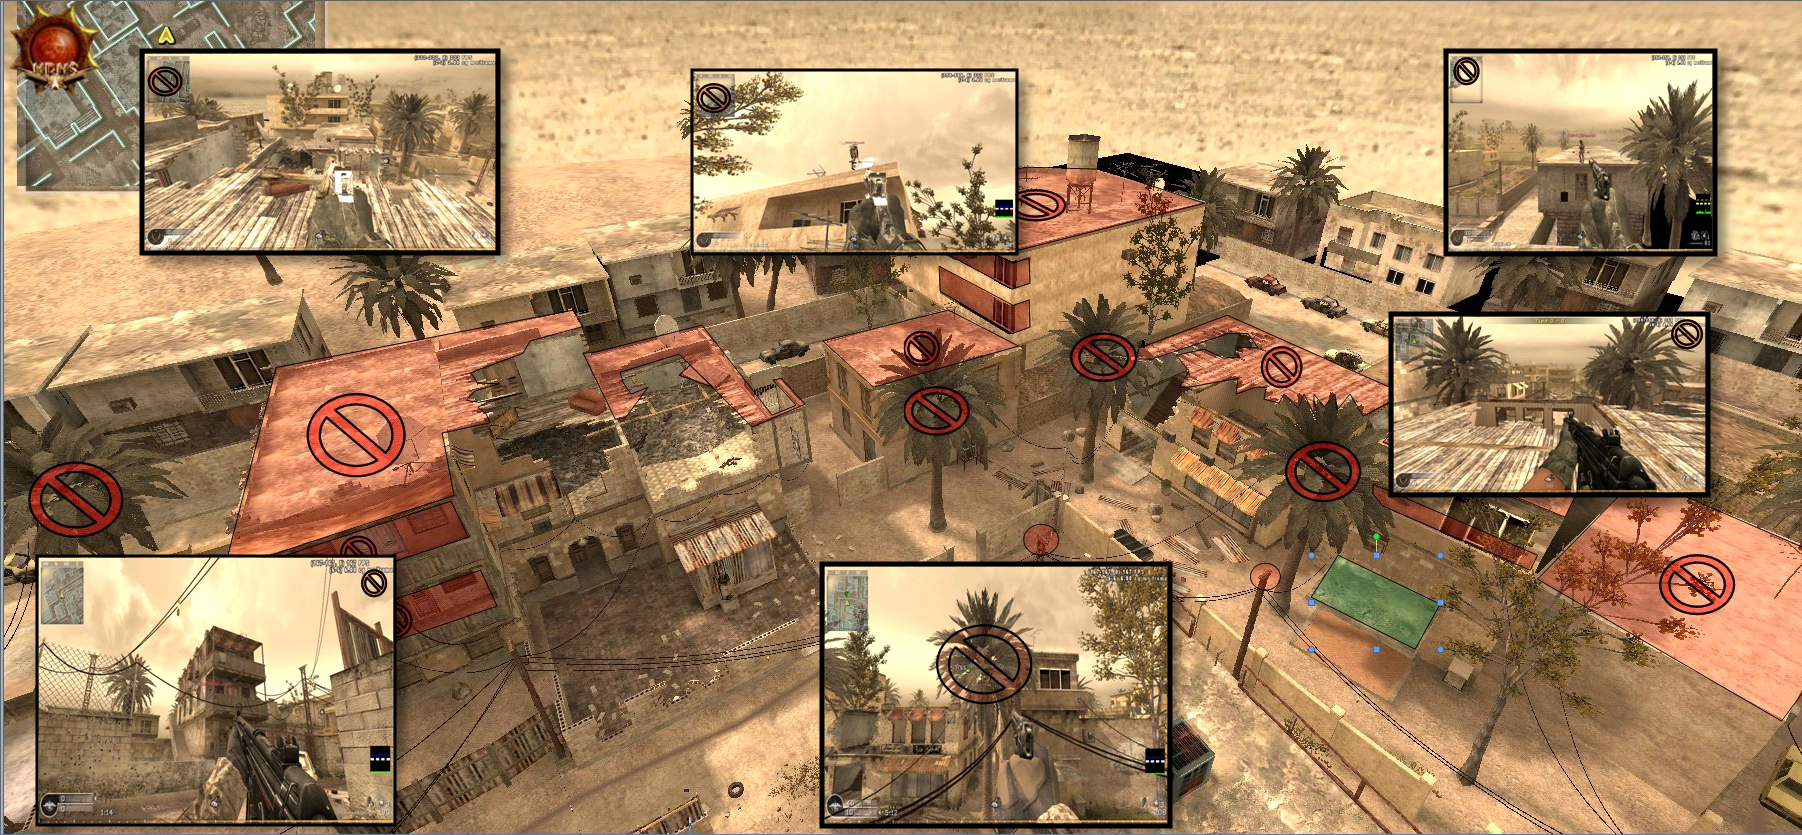 http://nrns-games.com/gallery/27551_28_11_15_2_30_20.png